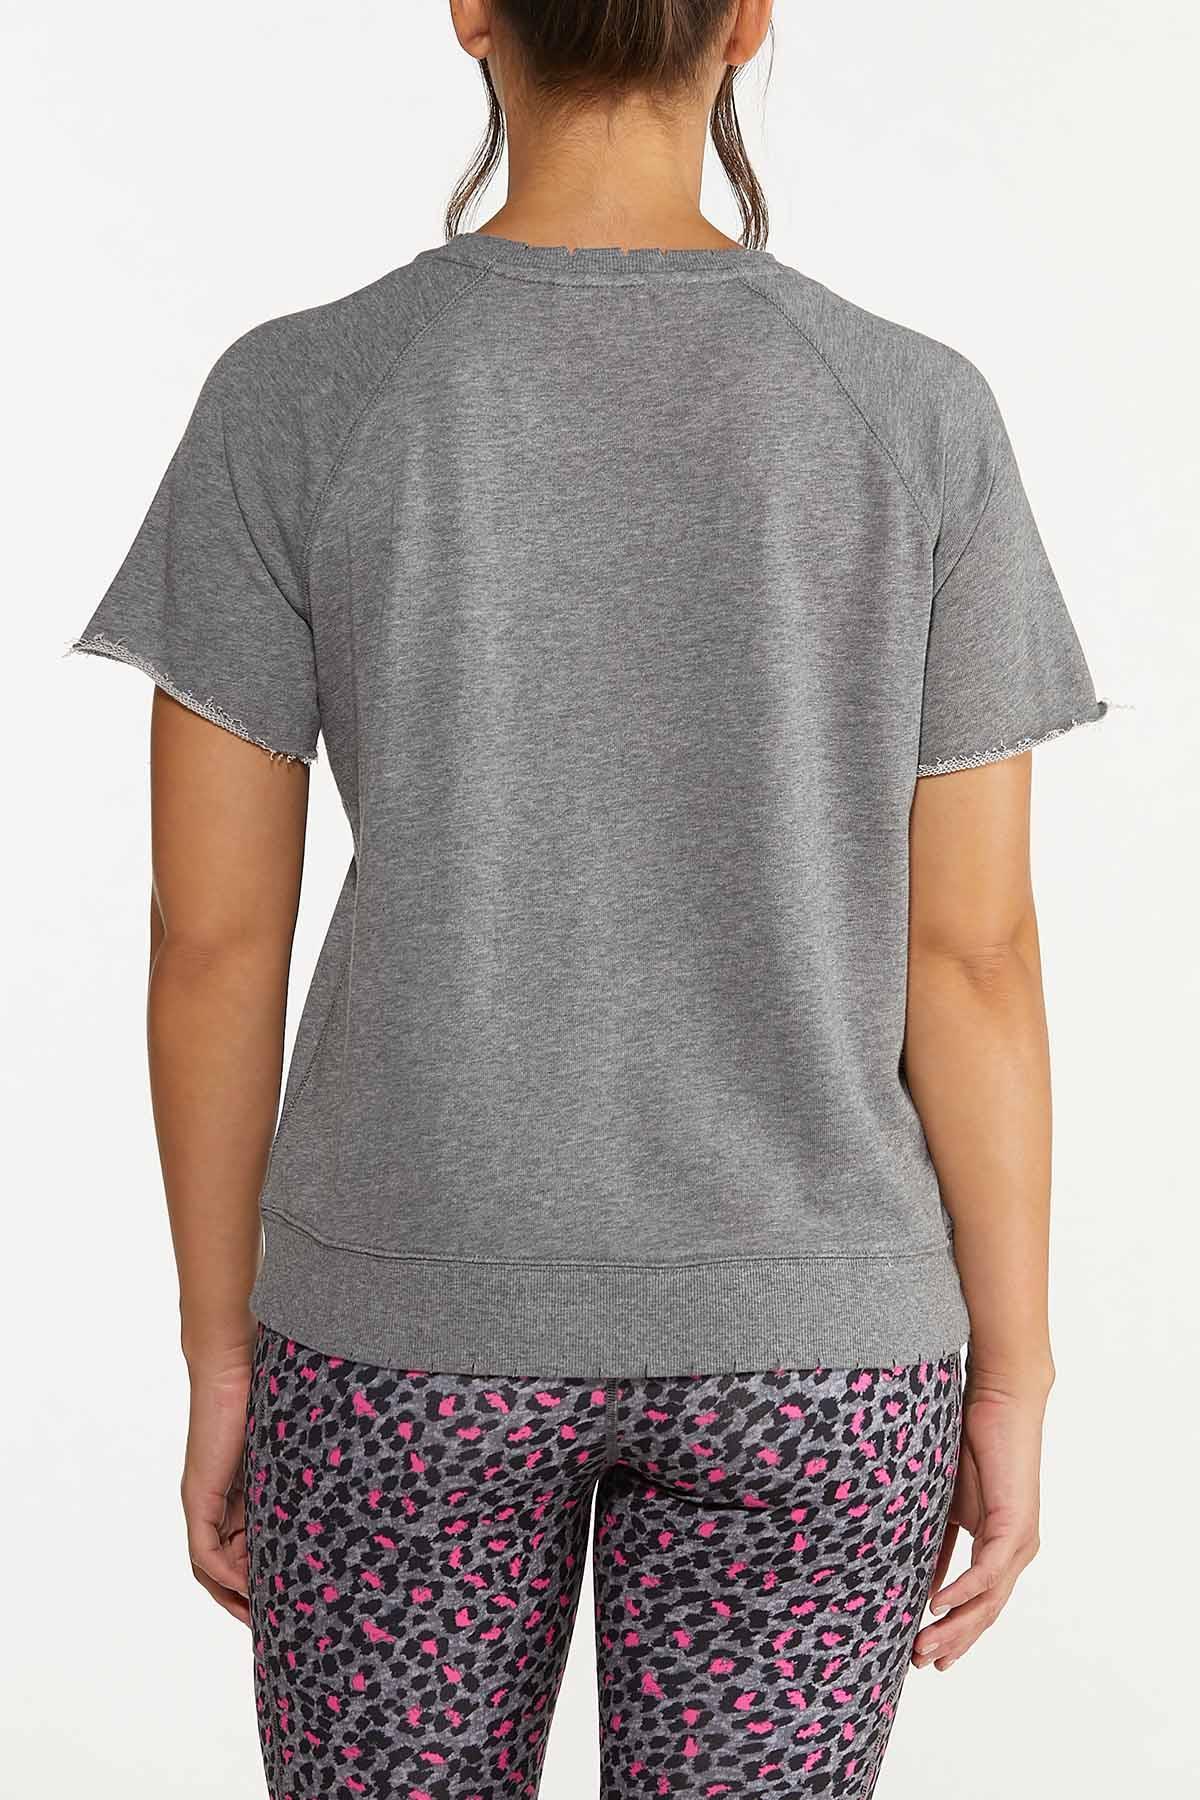 Distressed Sweatshirt (Item #44662115)